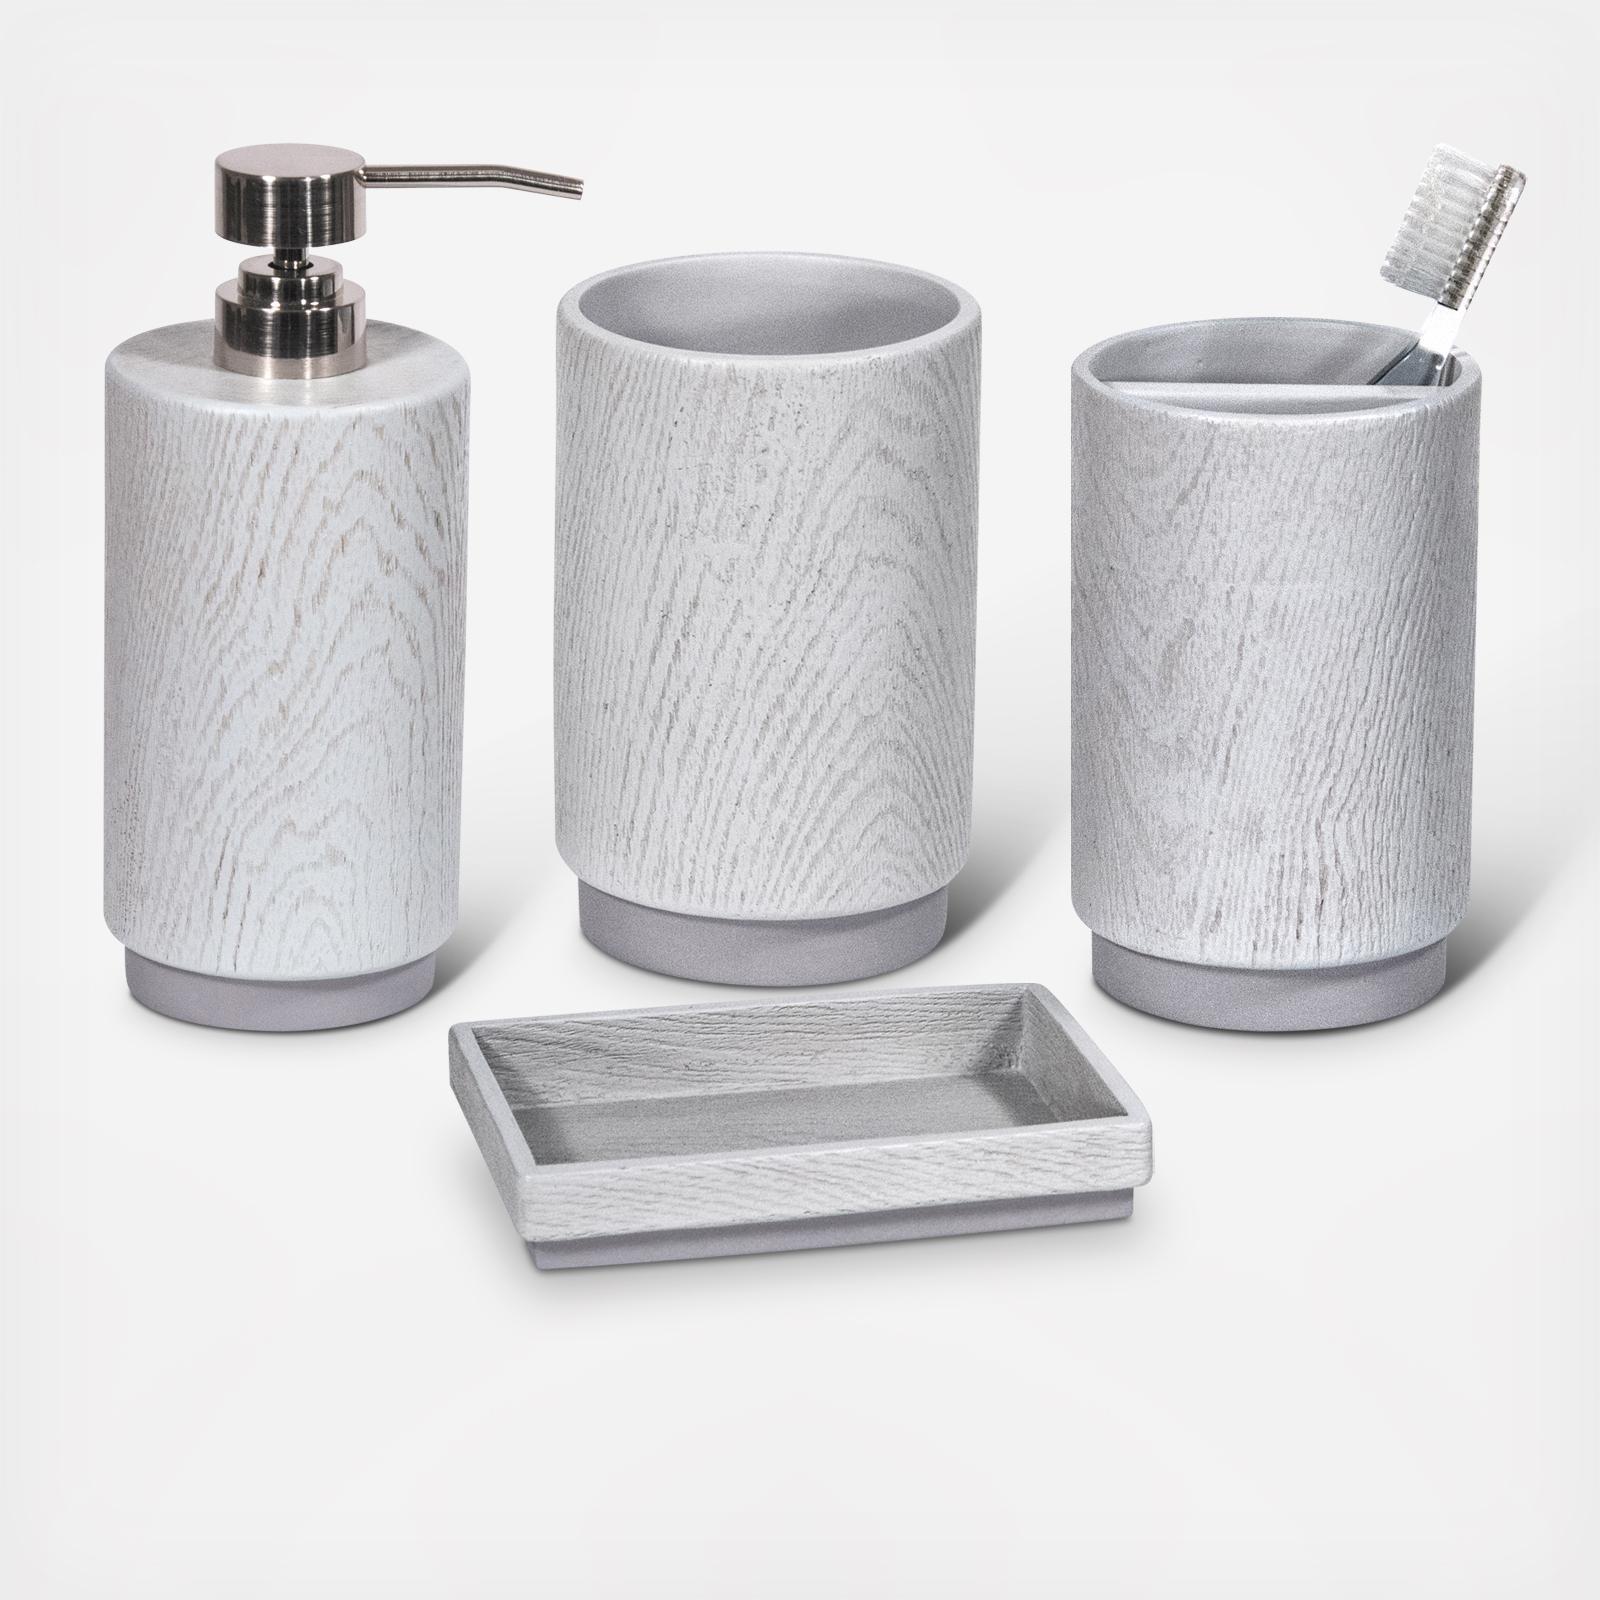 Superbe Grey Wood 4 Piece Bath Accessories Set By DKNY | Wedding Planning, Registry  U0026 Gifts